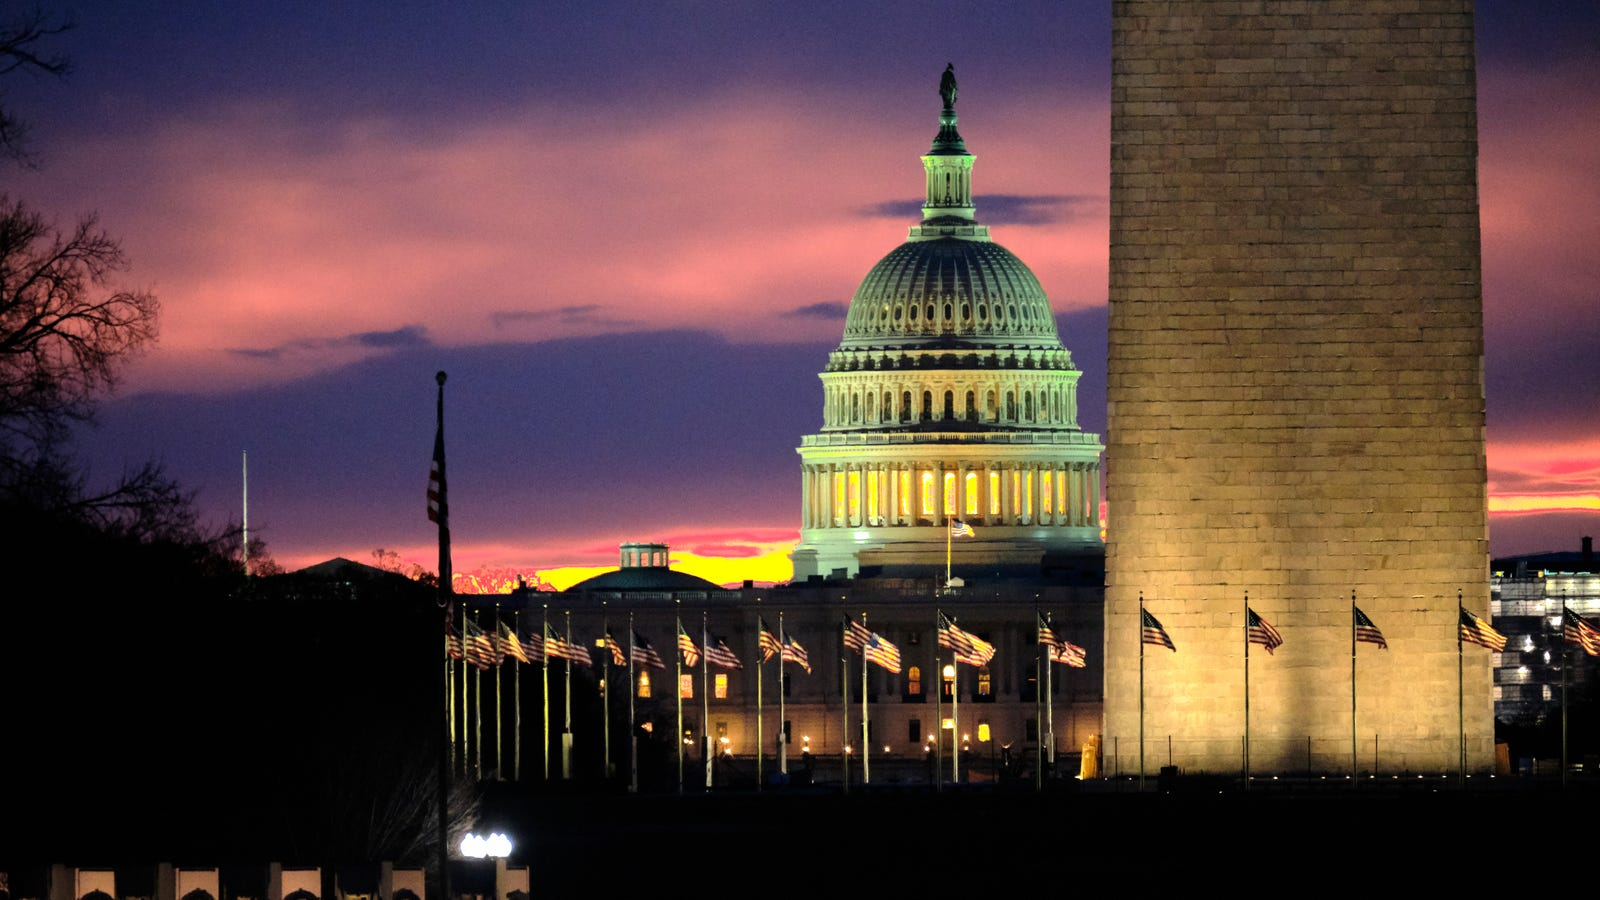 QnA VBage Senators Introduce Bill to Stop 'Dark Patterns' Huge Platforms Use to Trick Users